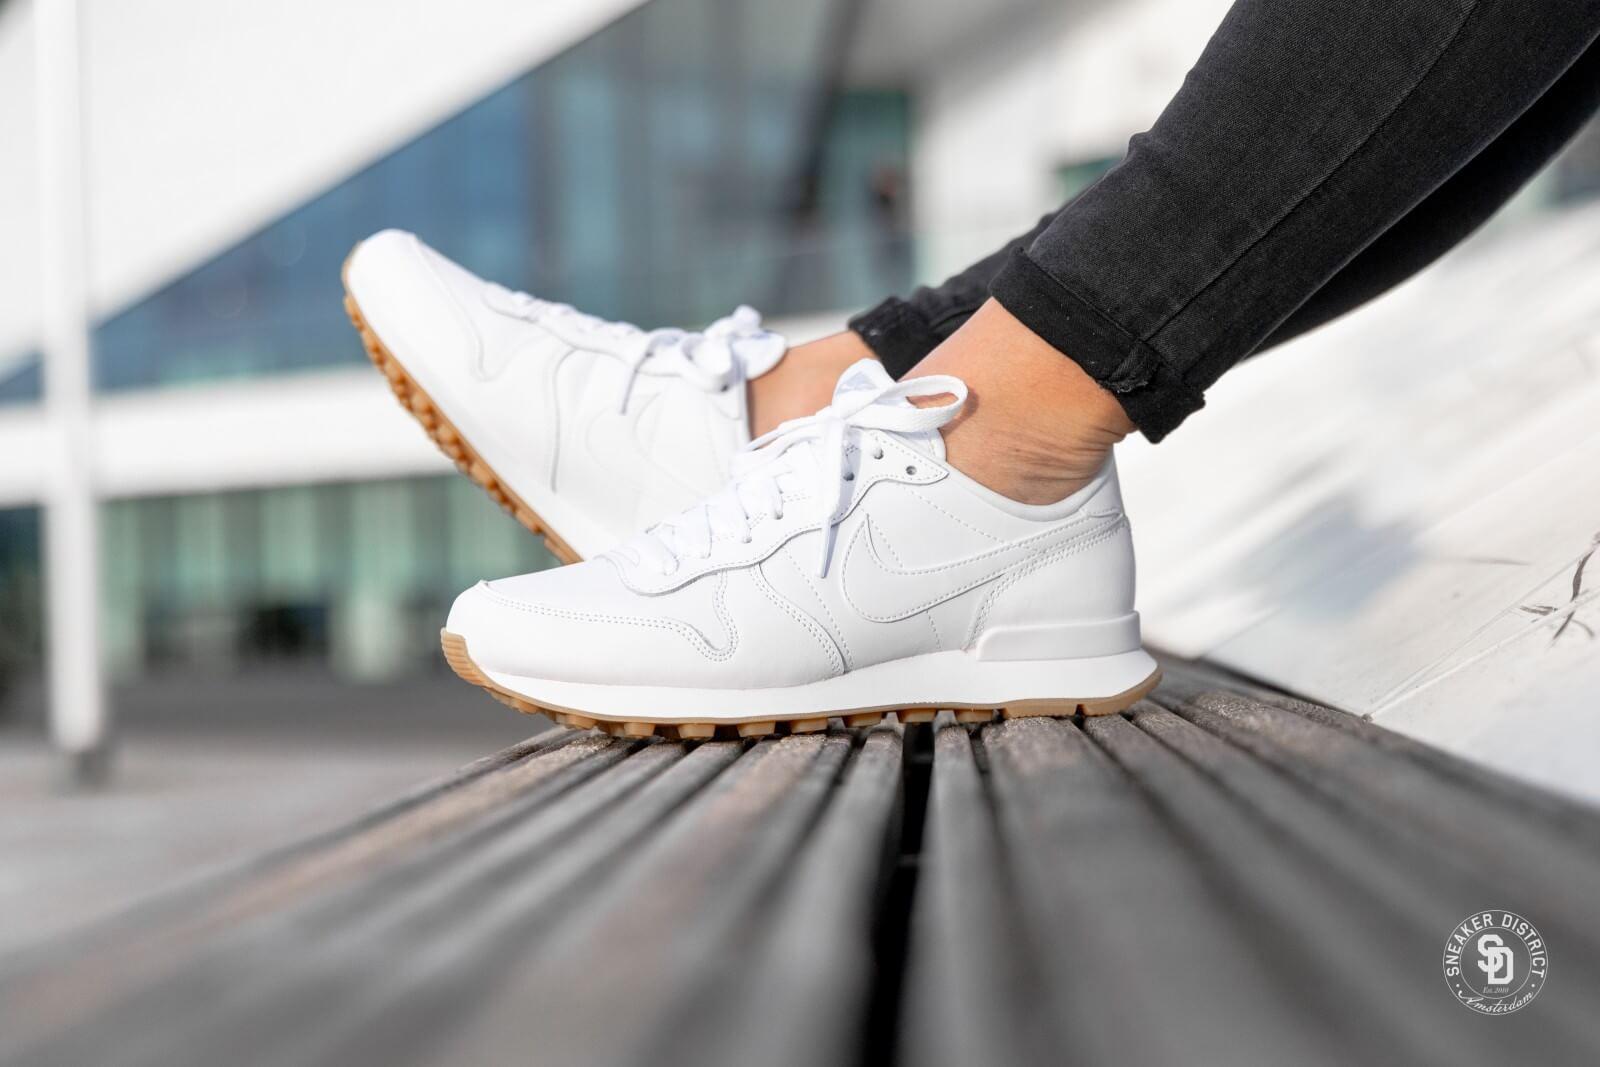 táctica Resplandor Ru  Nike Women's Internationalist White/White-Gum Light Brown - 828407-103